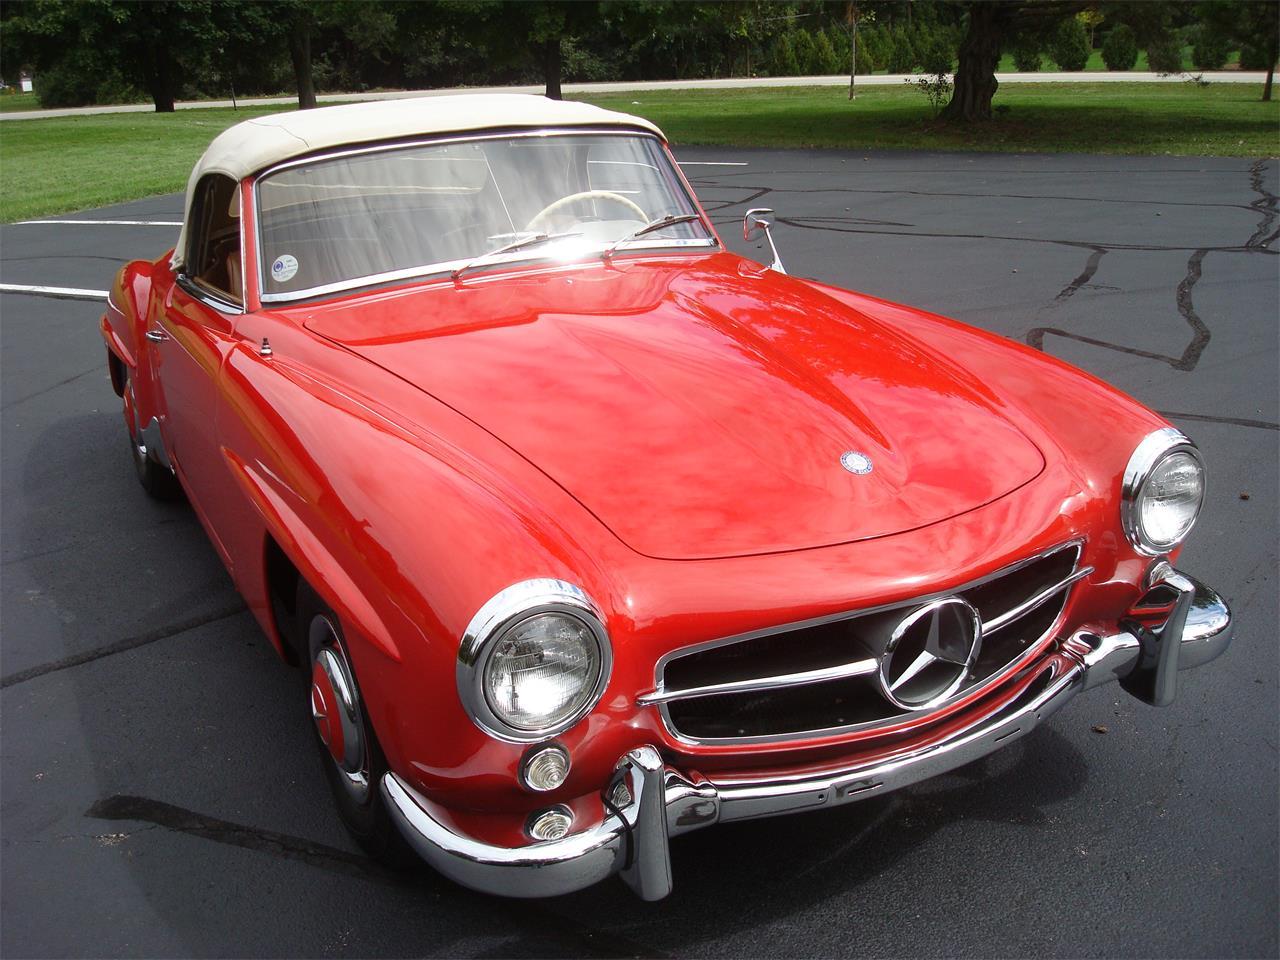 1958 Mercedes-Benz 190SL for sale in Naperville, IL ...